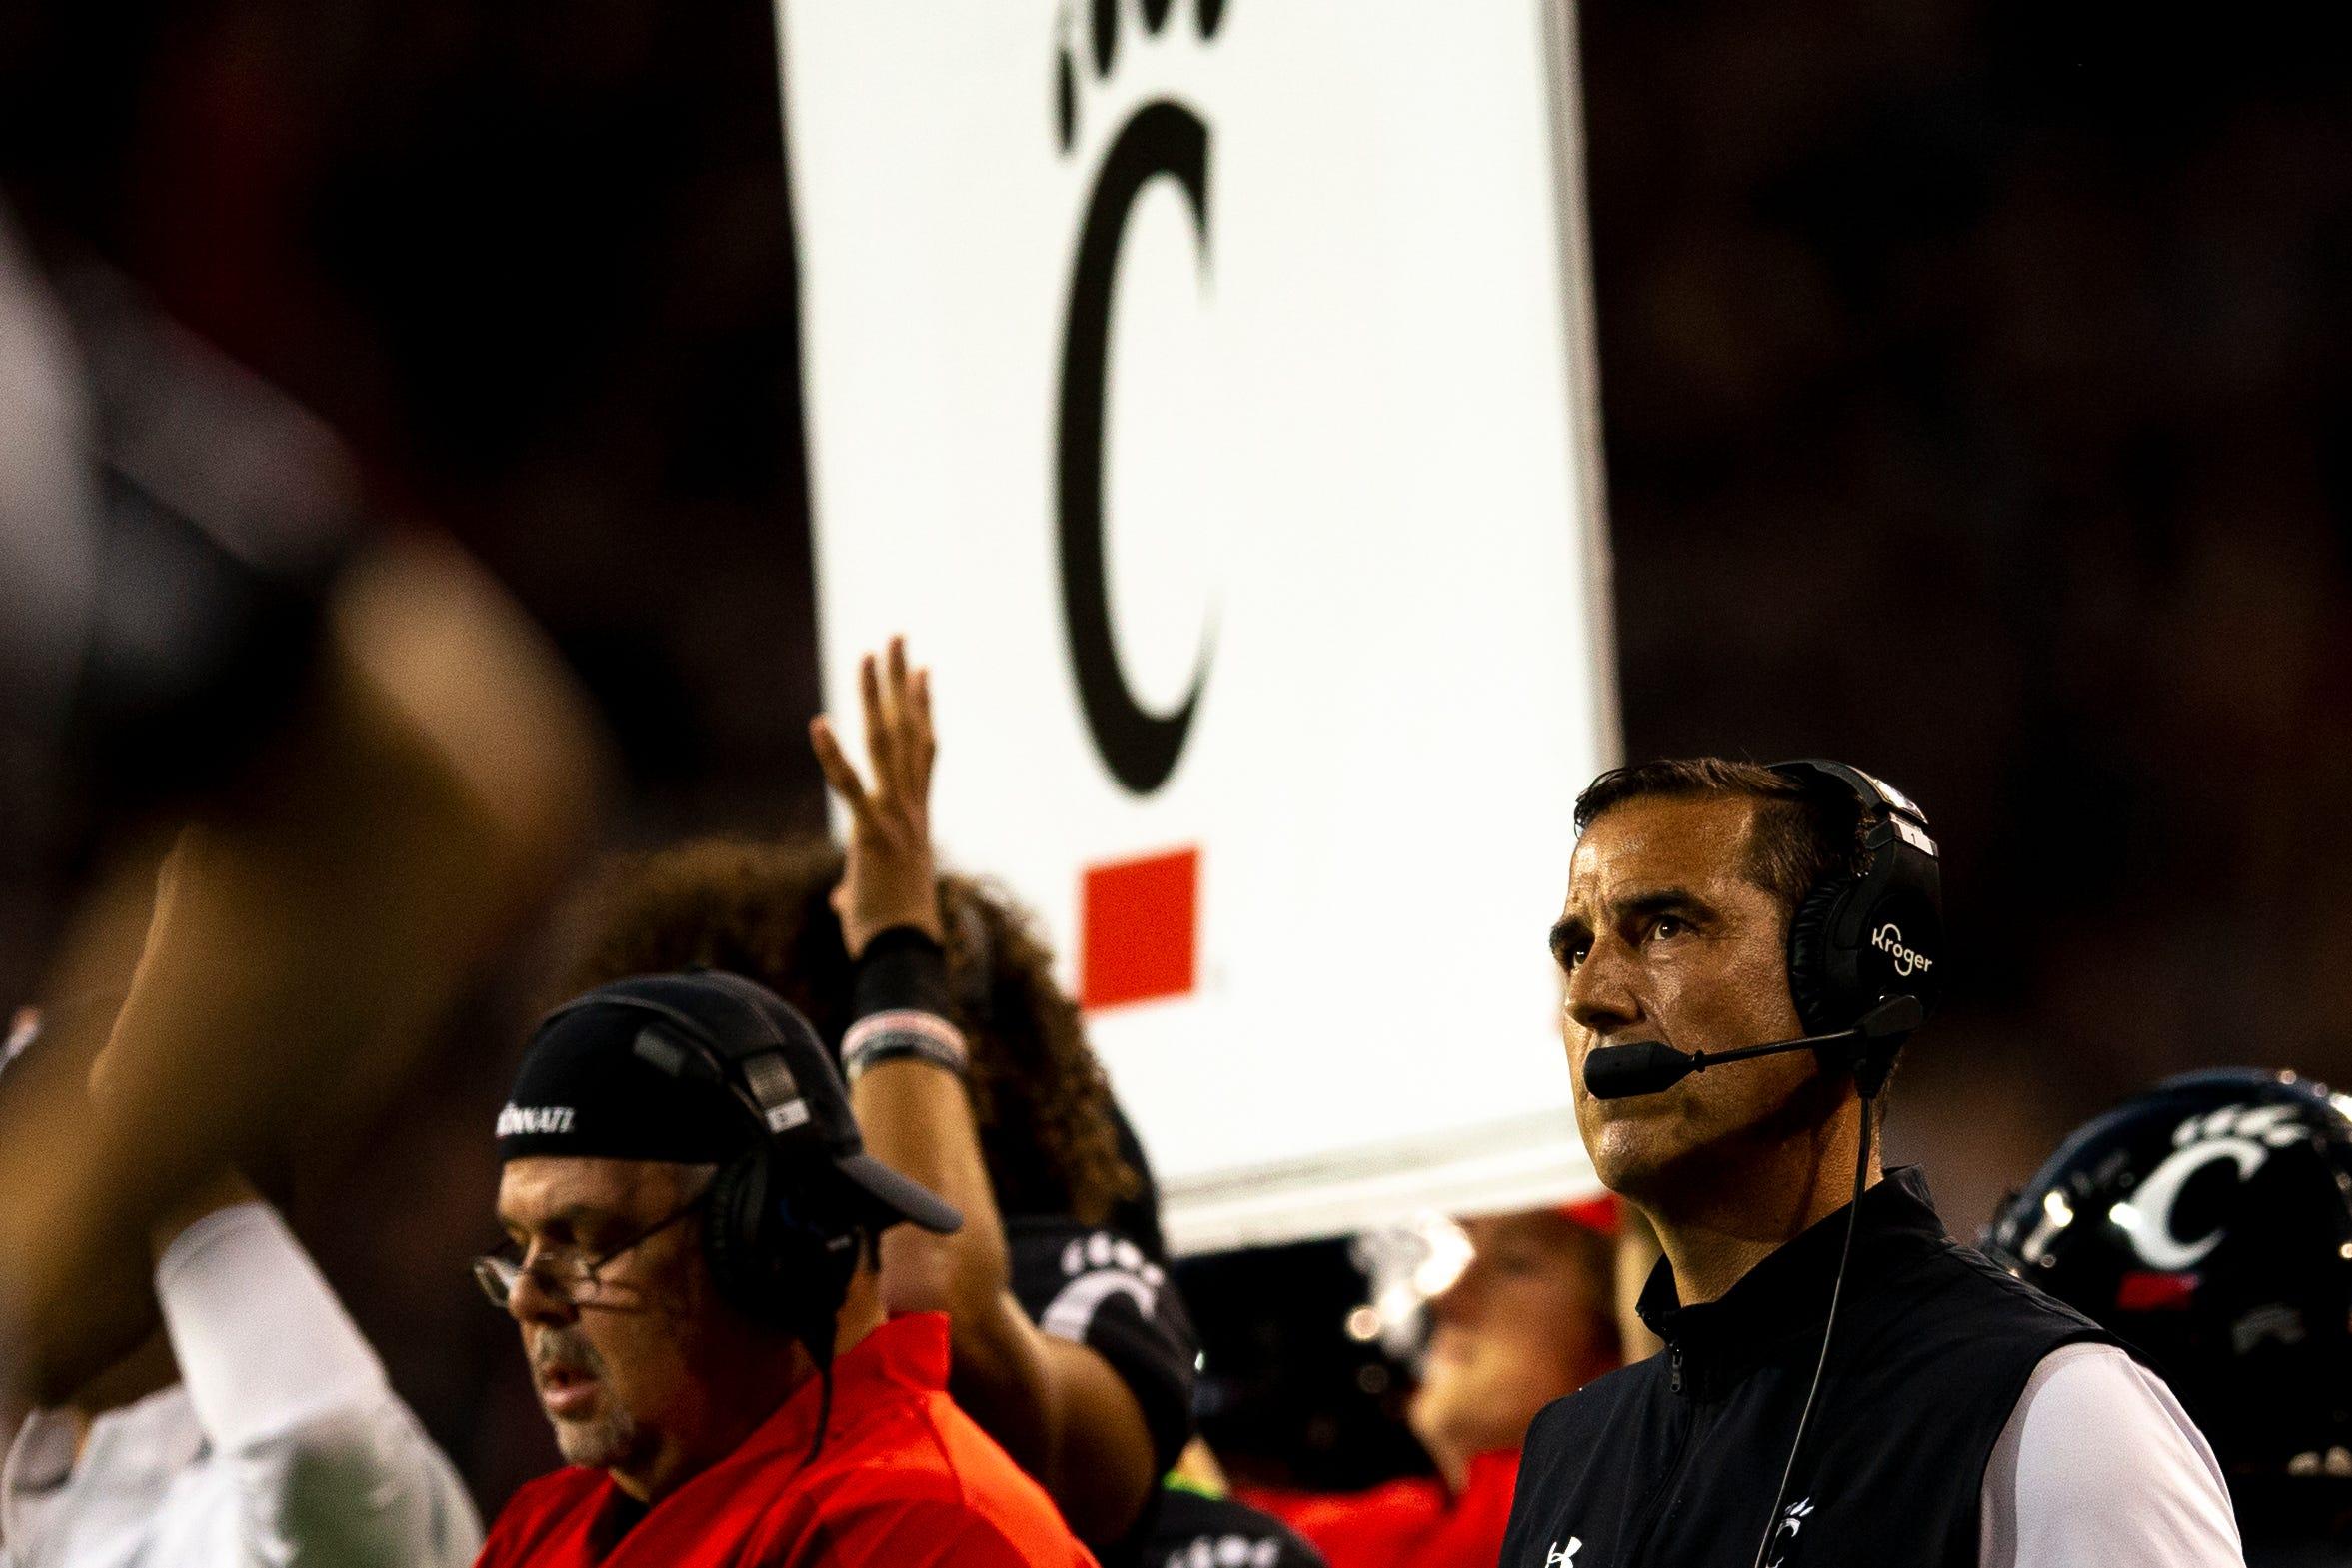 See where Cincinnati Bearcats head coach Luke Fickell ranks in college football salaries